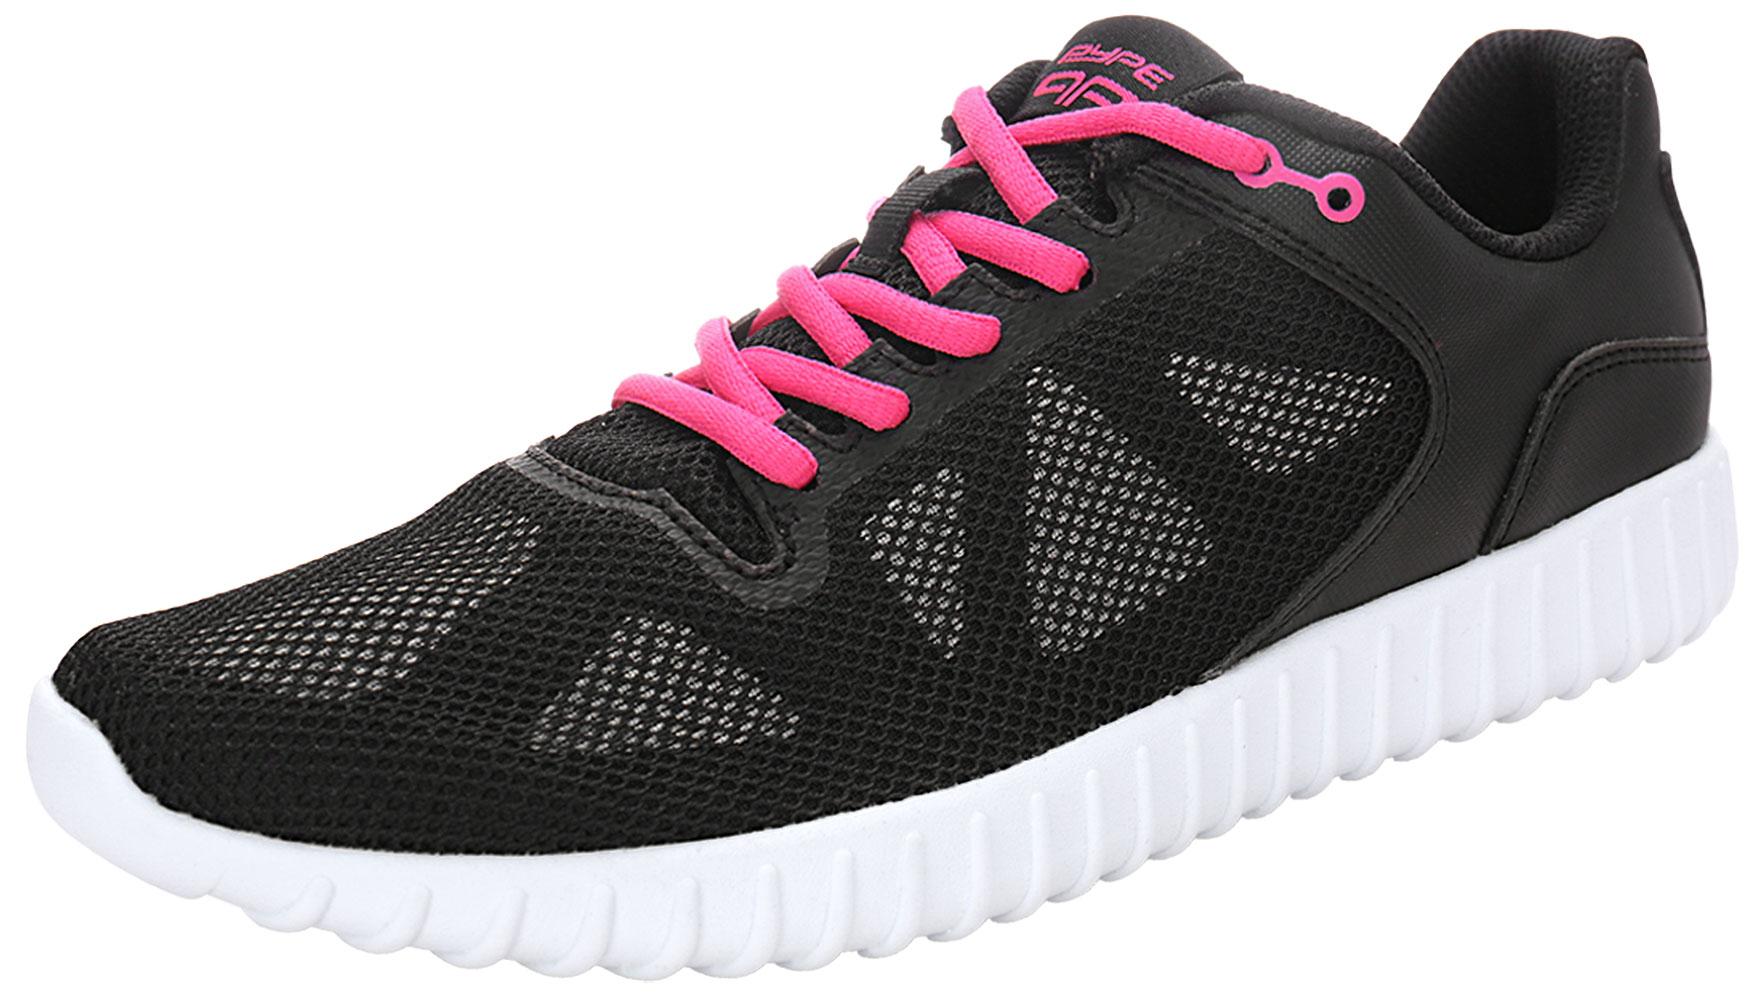 PYPE Women Geometric Prints Lace Up Mesh Training Shoes Black US 9